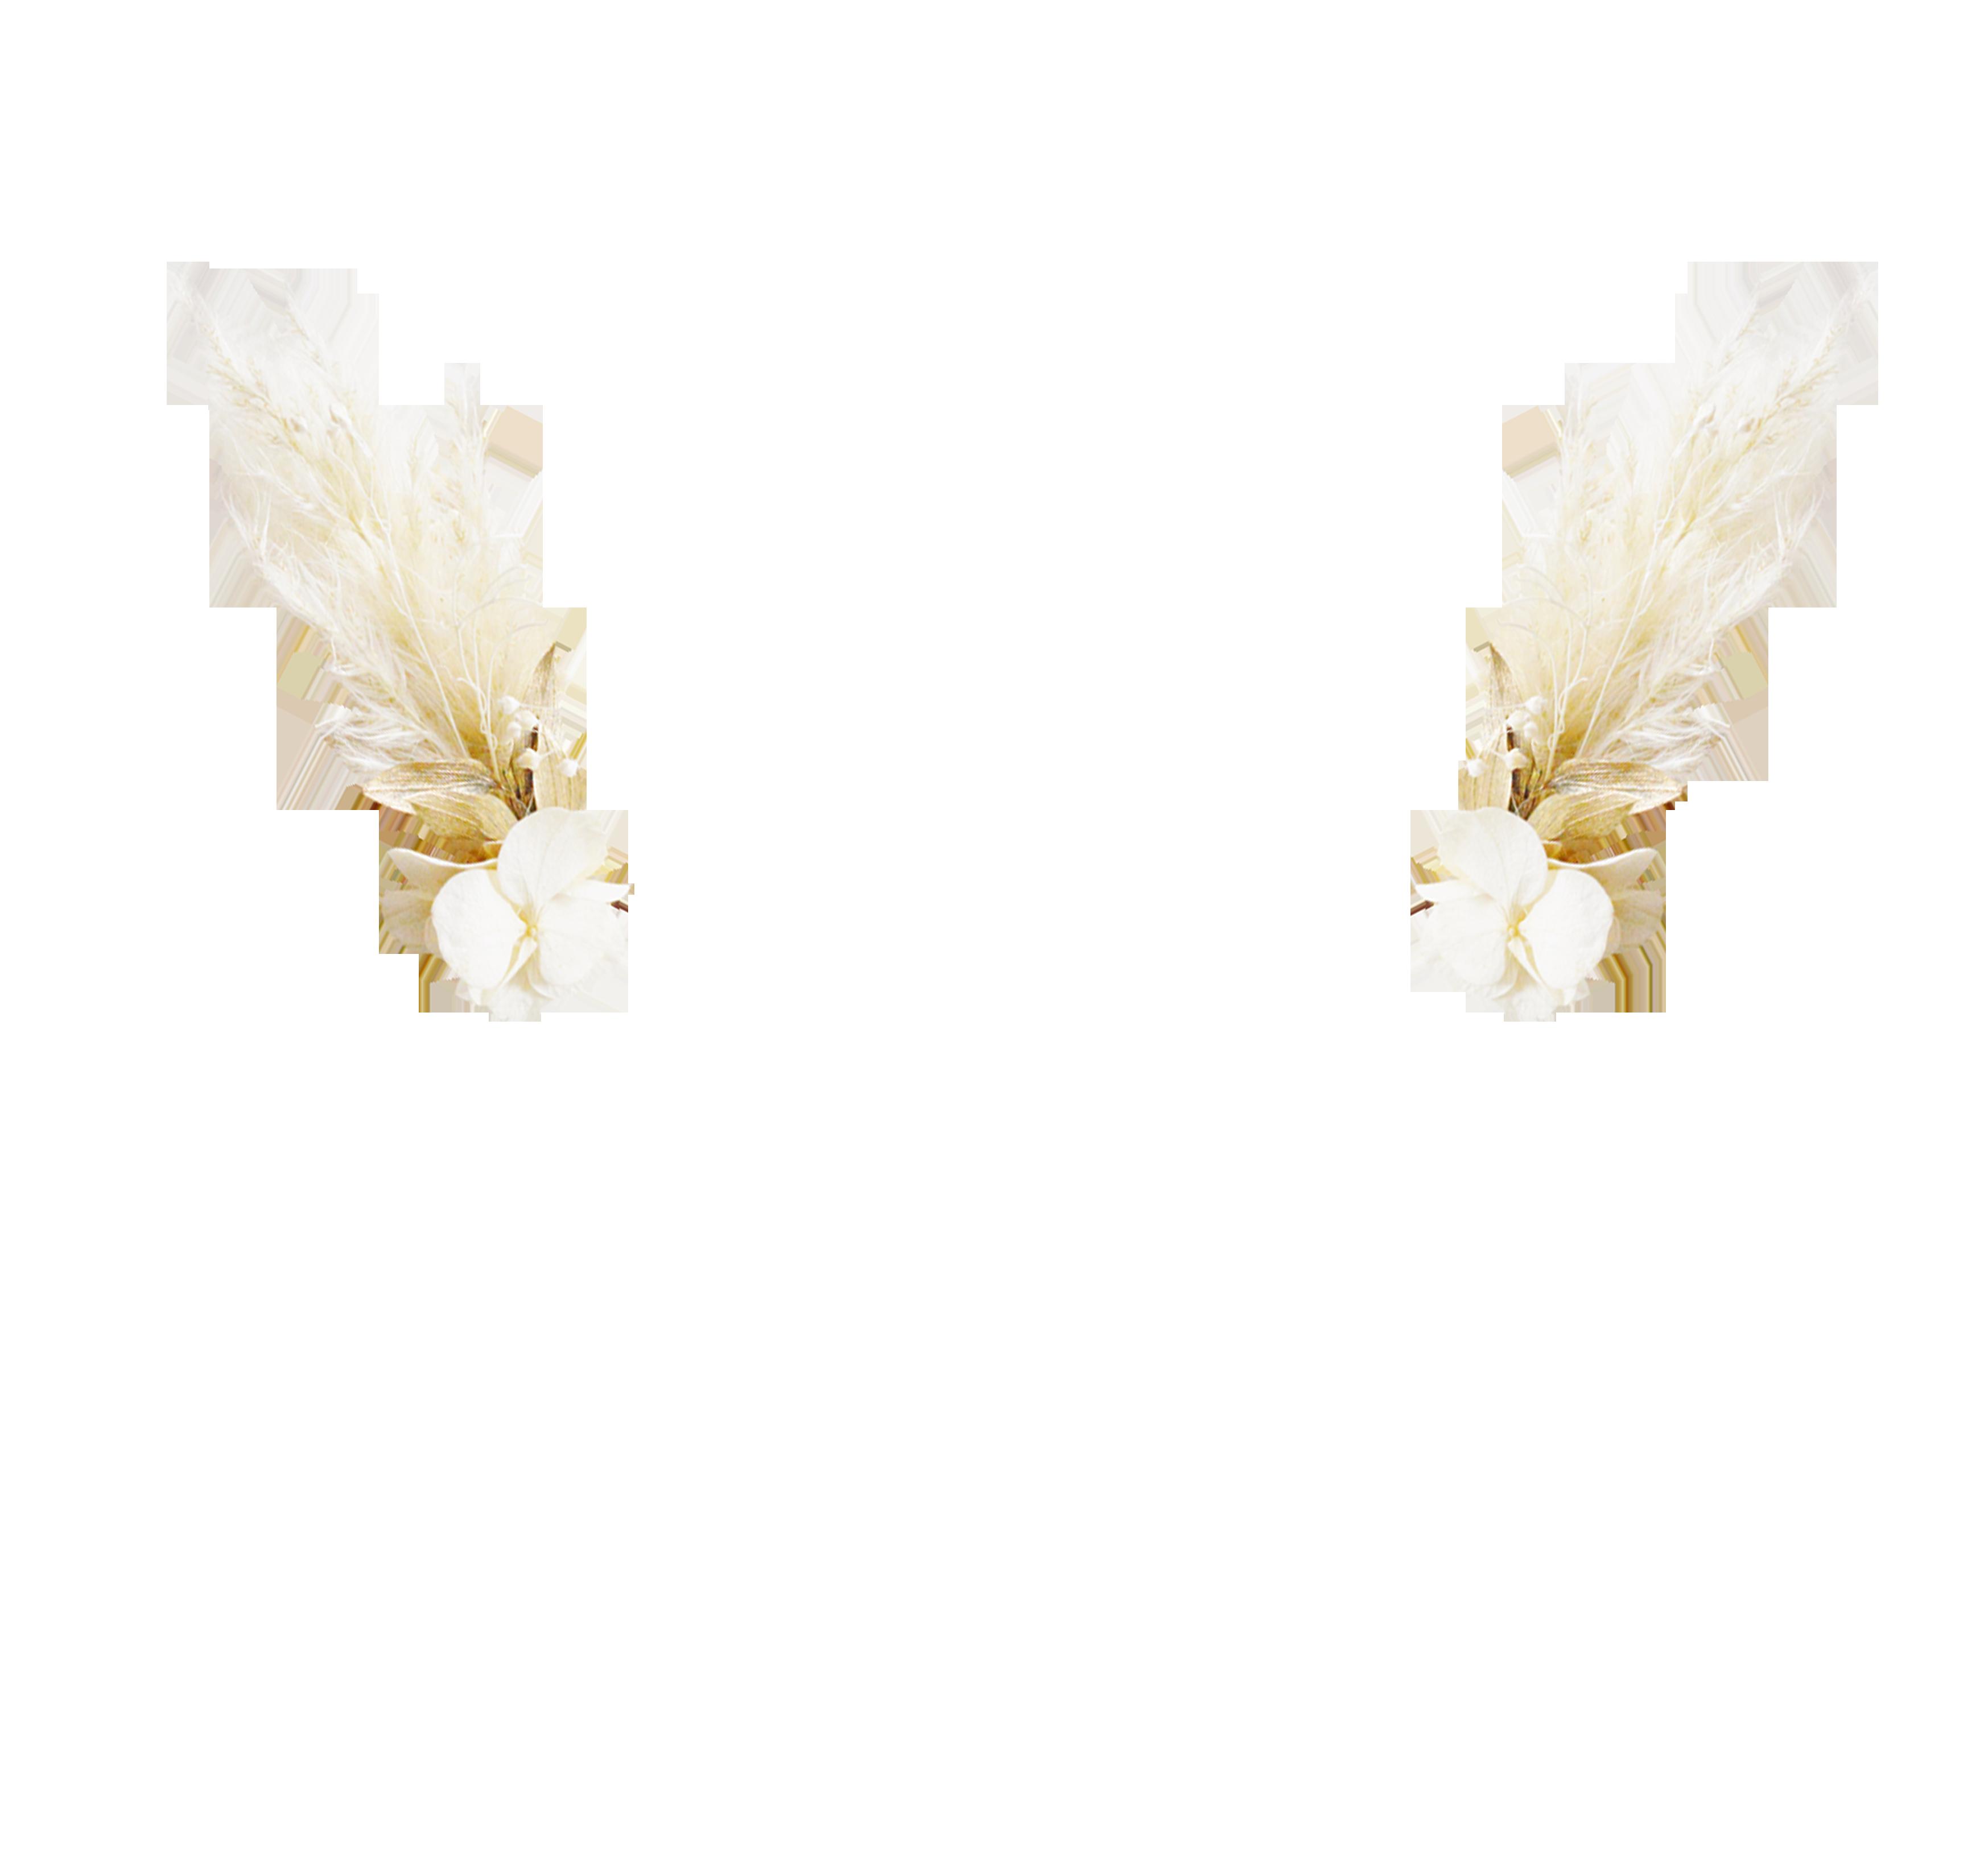 Pampa et hortensia ivoire